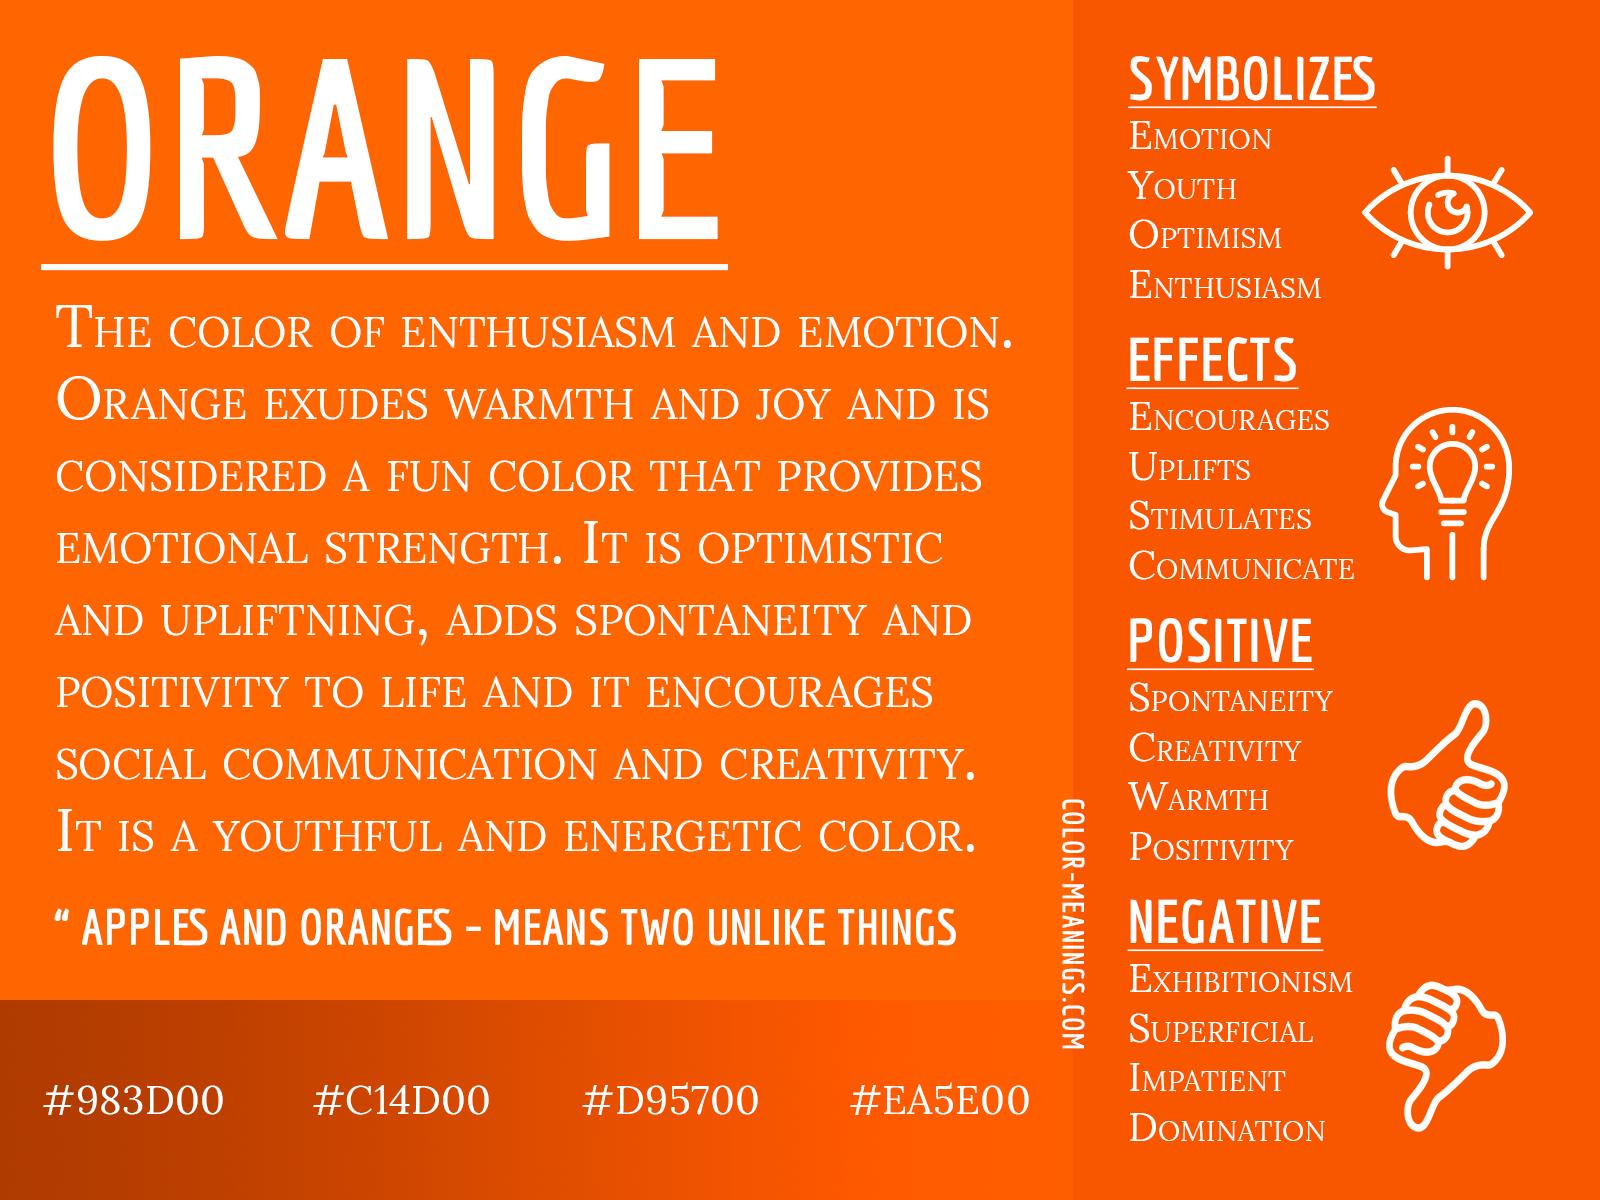 Orange Color Meaning – The Color Orange Symbolizes Enthusiasm and Emotion